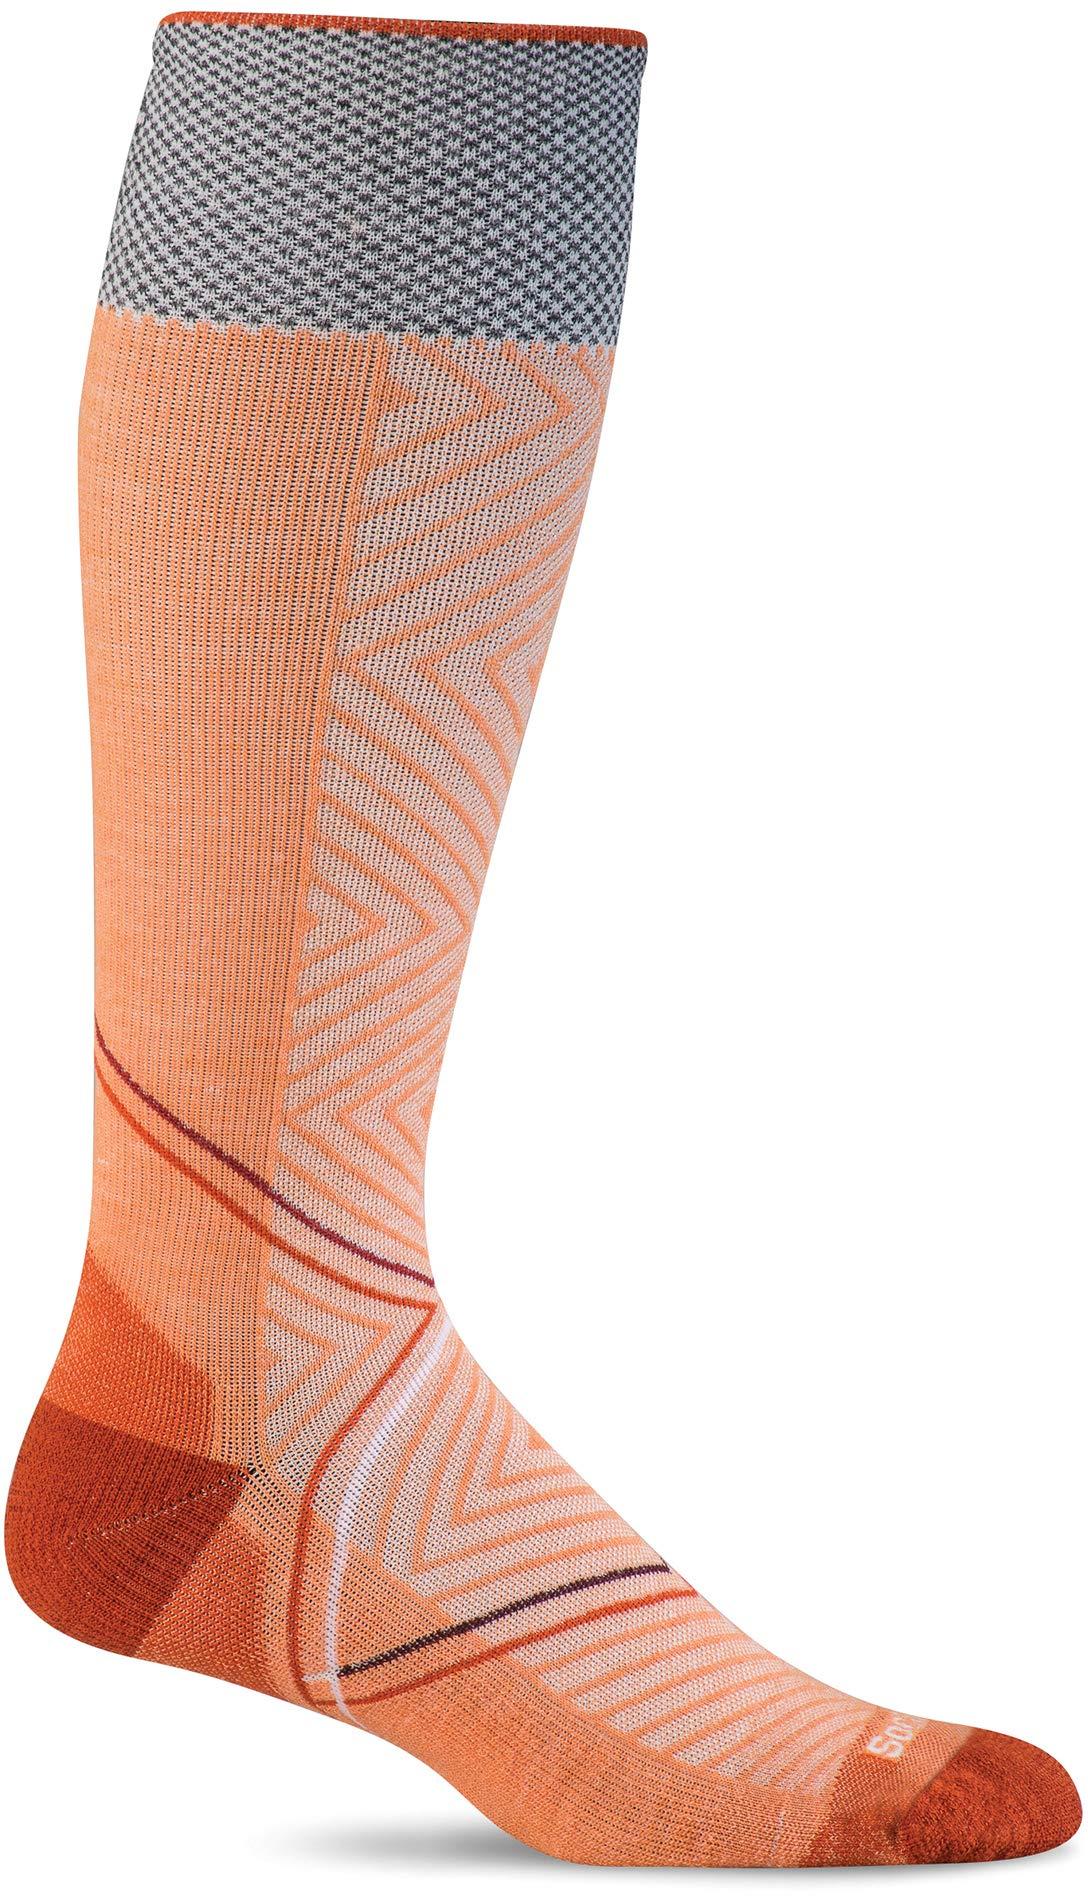 Sockwell Women's Pulse Graduated Compression Socks